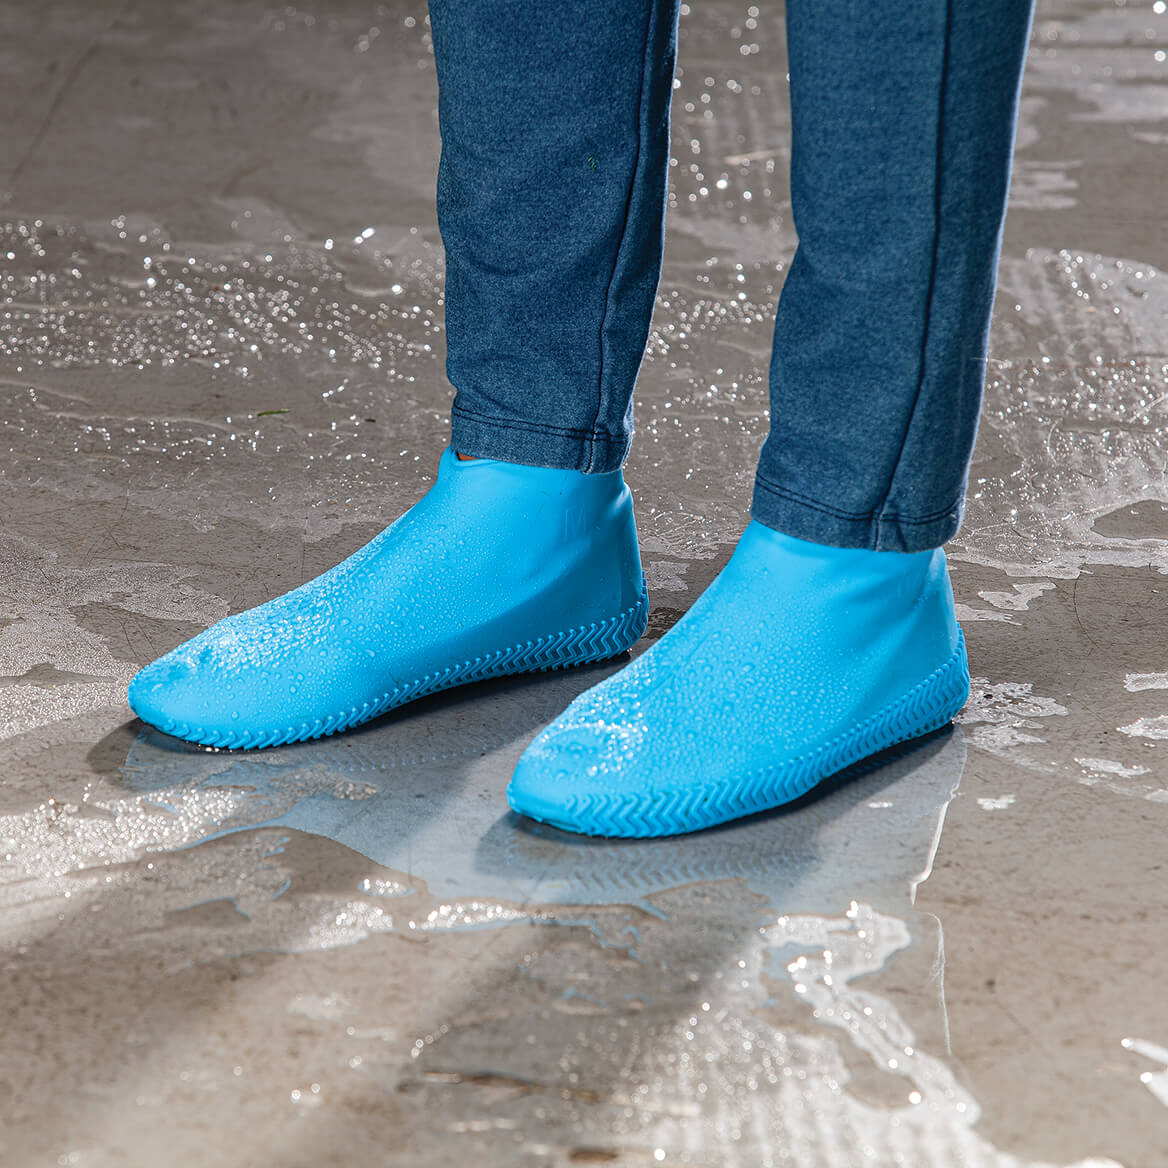 Waterproof Reusable Silicone Shoe Protectors-371373